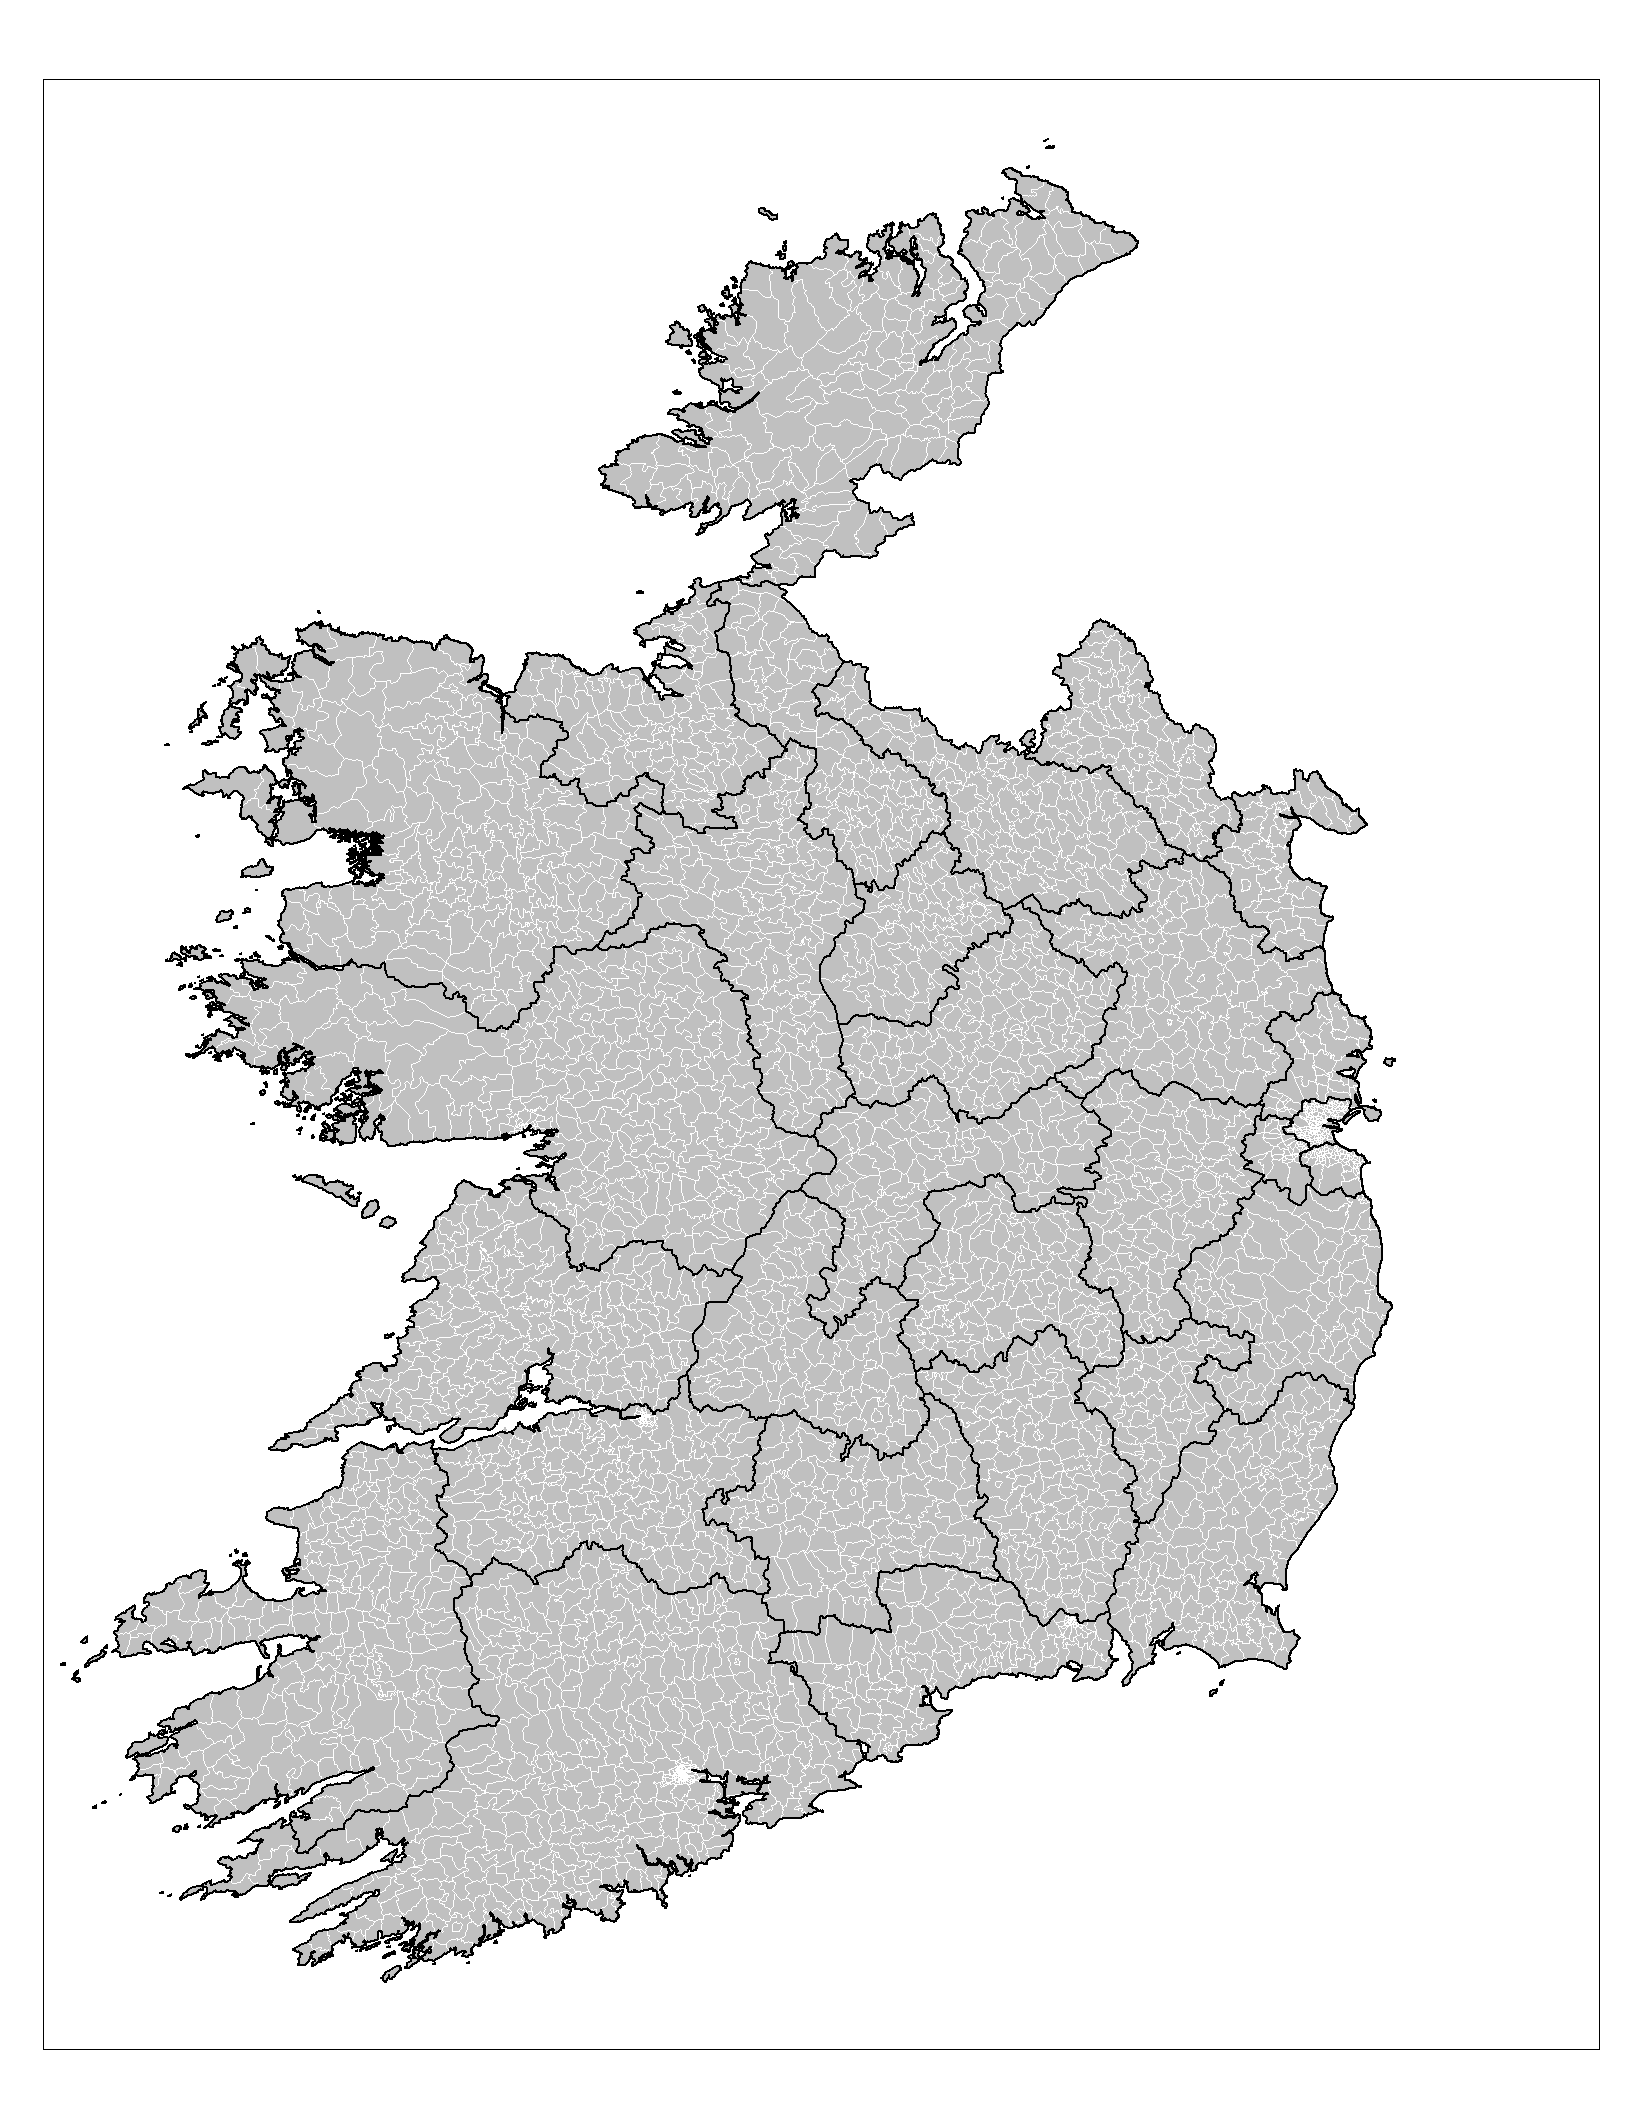 1632 in Ireland